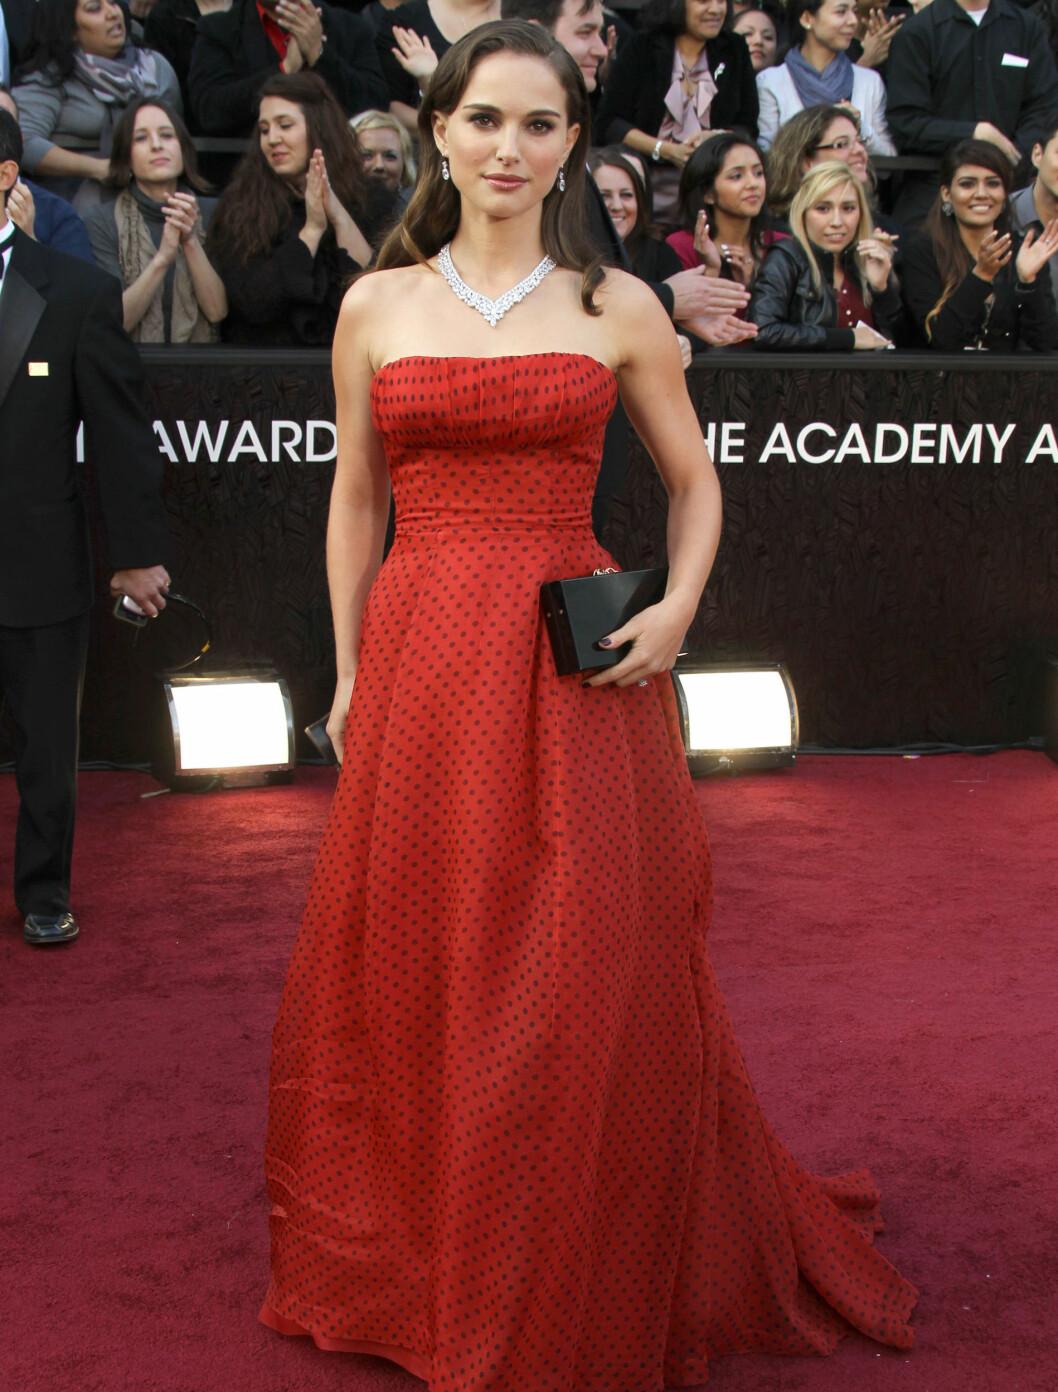 TANTETE: Natalie Portman valgte en kjole fra det legendariske motehuset Dior, men Time Entertainments kritiker forstår ikke hvorfor filmstjernen plukket ut en tantete rød, polkadot-kjole når hun kunne valgt hvilken som helst perle fra Diors historiske  Foto: All Over Press